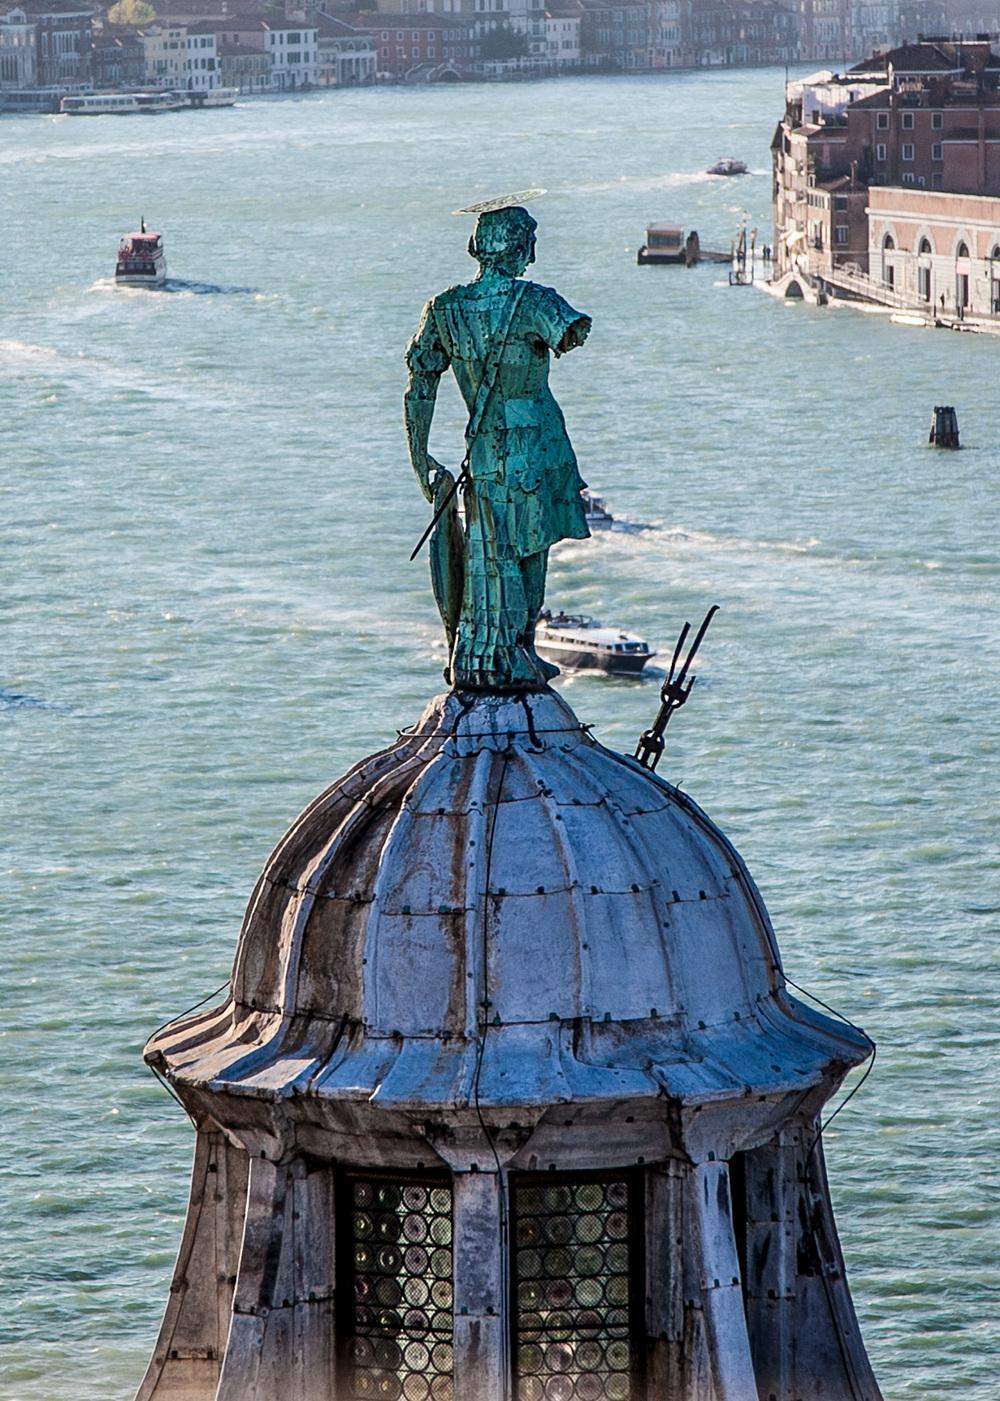 Over looking the Venetian Lagoon